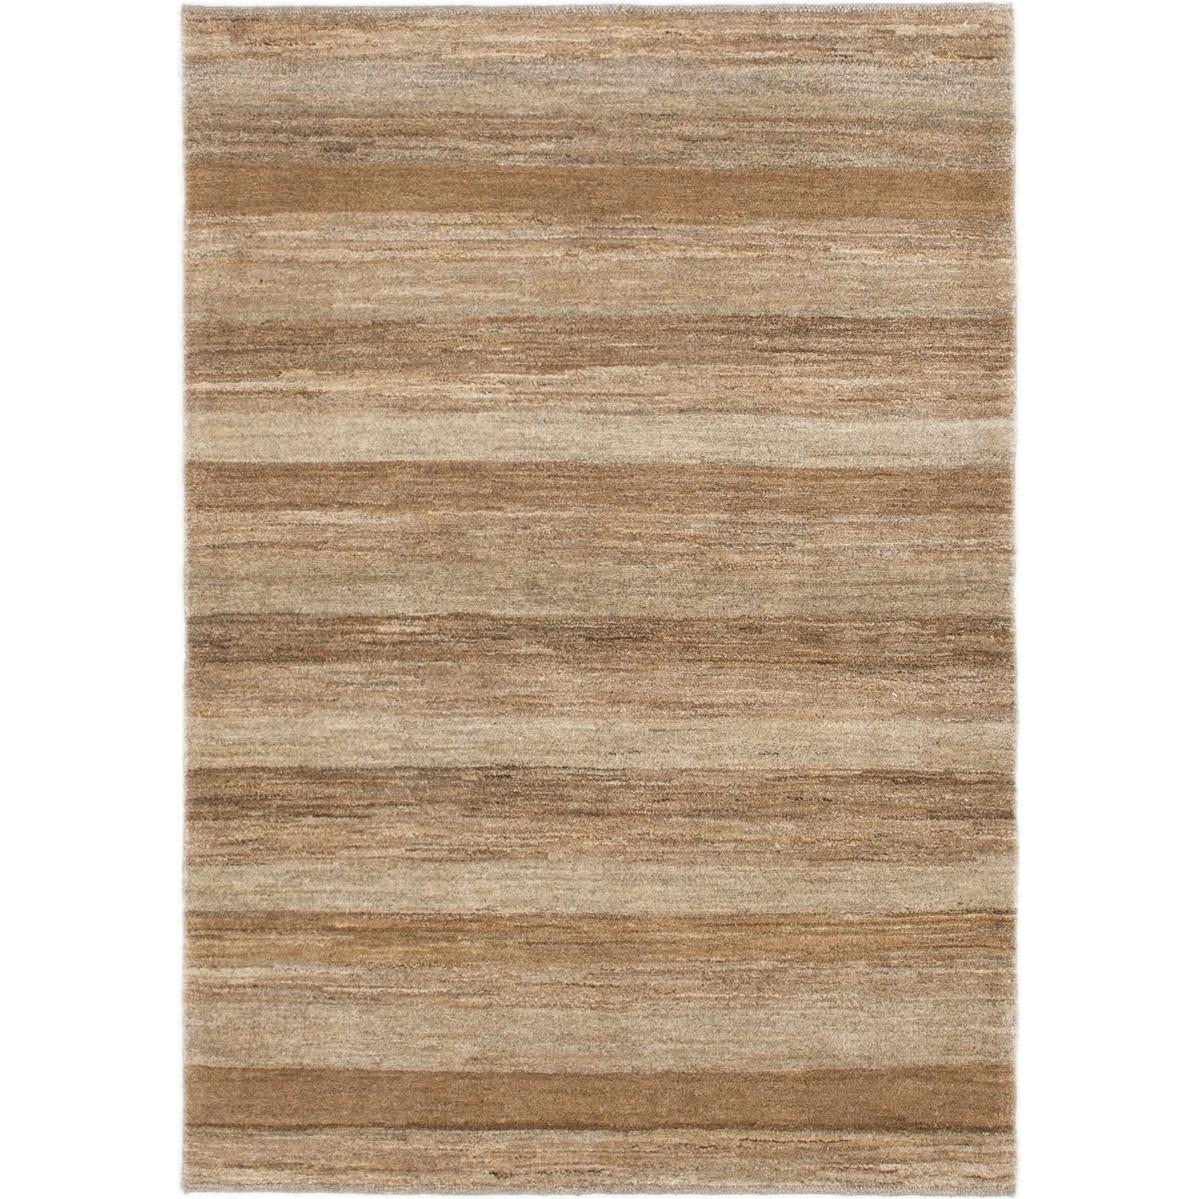 Hand Knotted Kashkuli Gabbeh Wool Area Rug - 3 6 x 5 (Brown - 3 6 x 5)